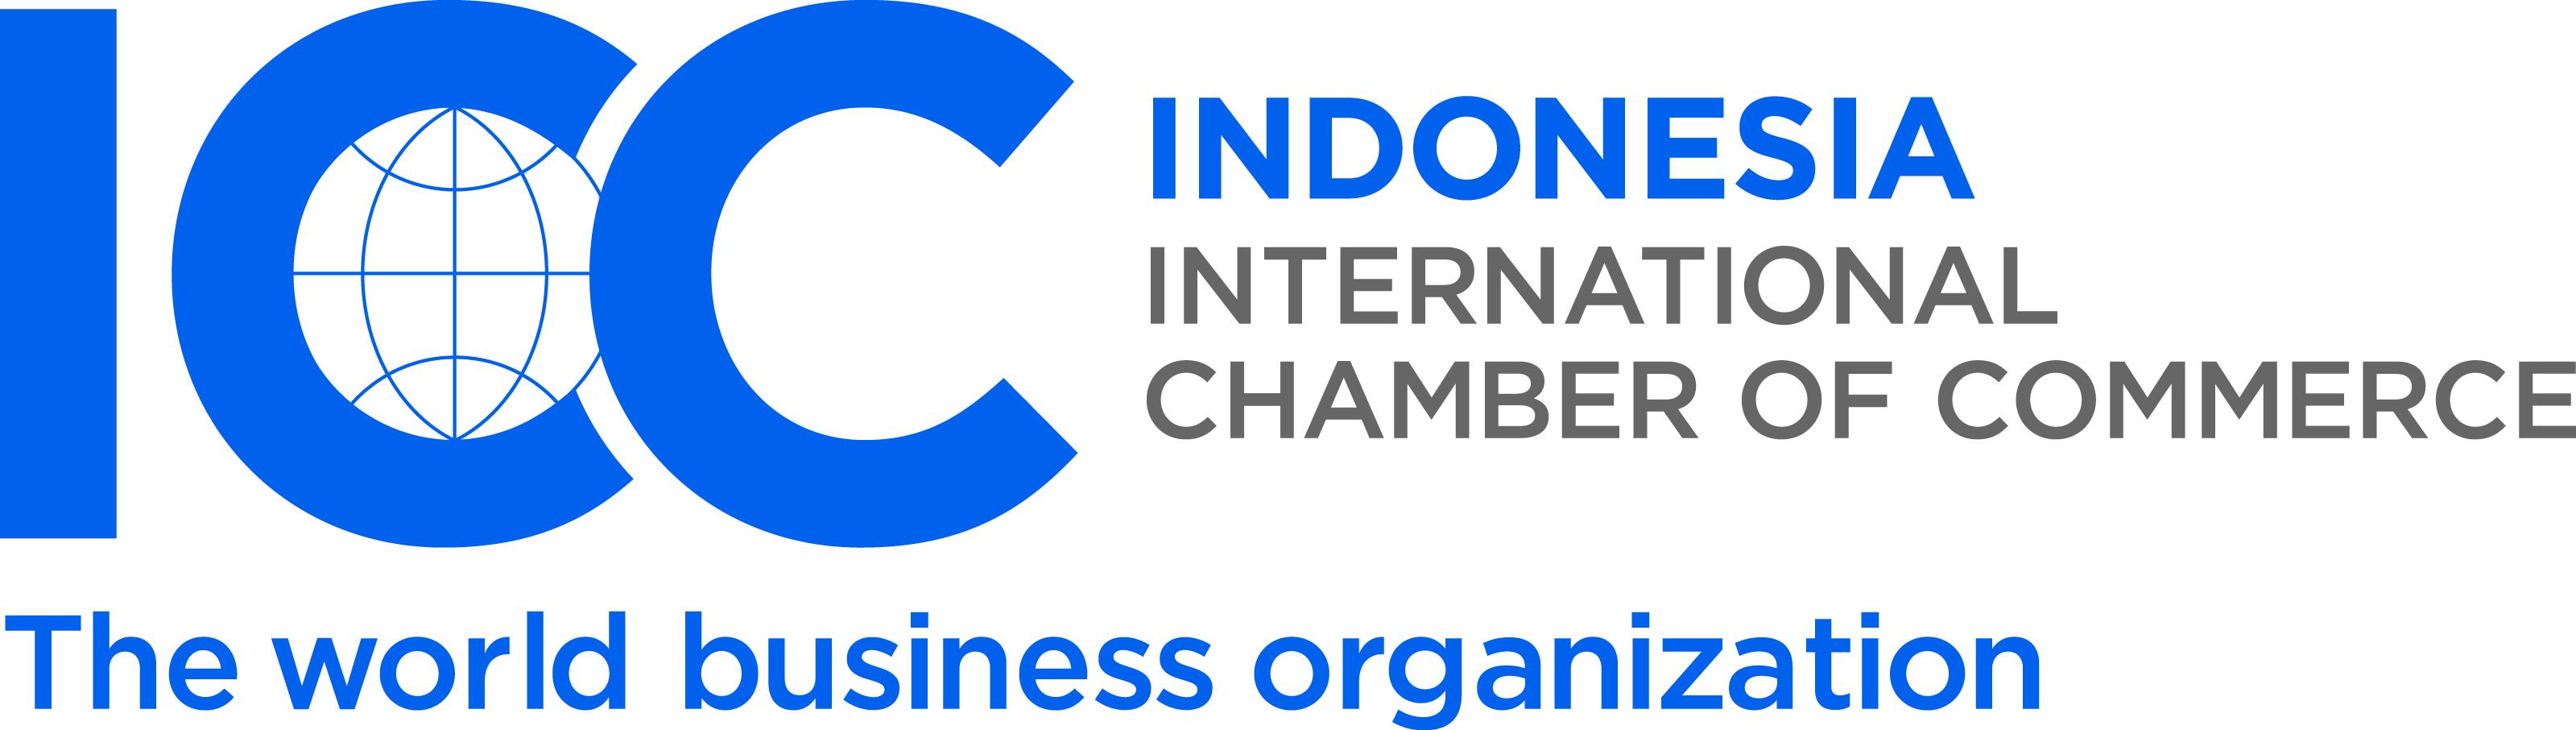 ICC NC WBO Horz logo_ID_CMYK (002)